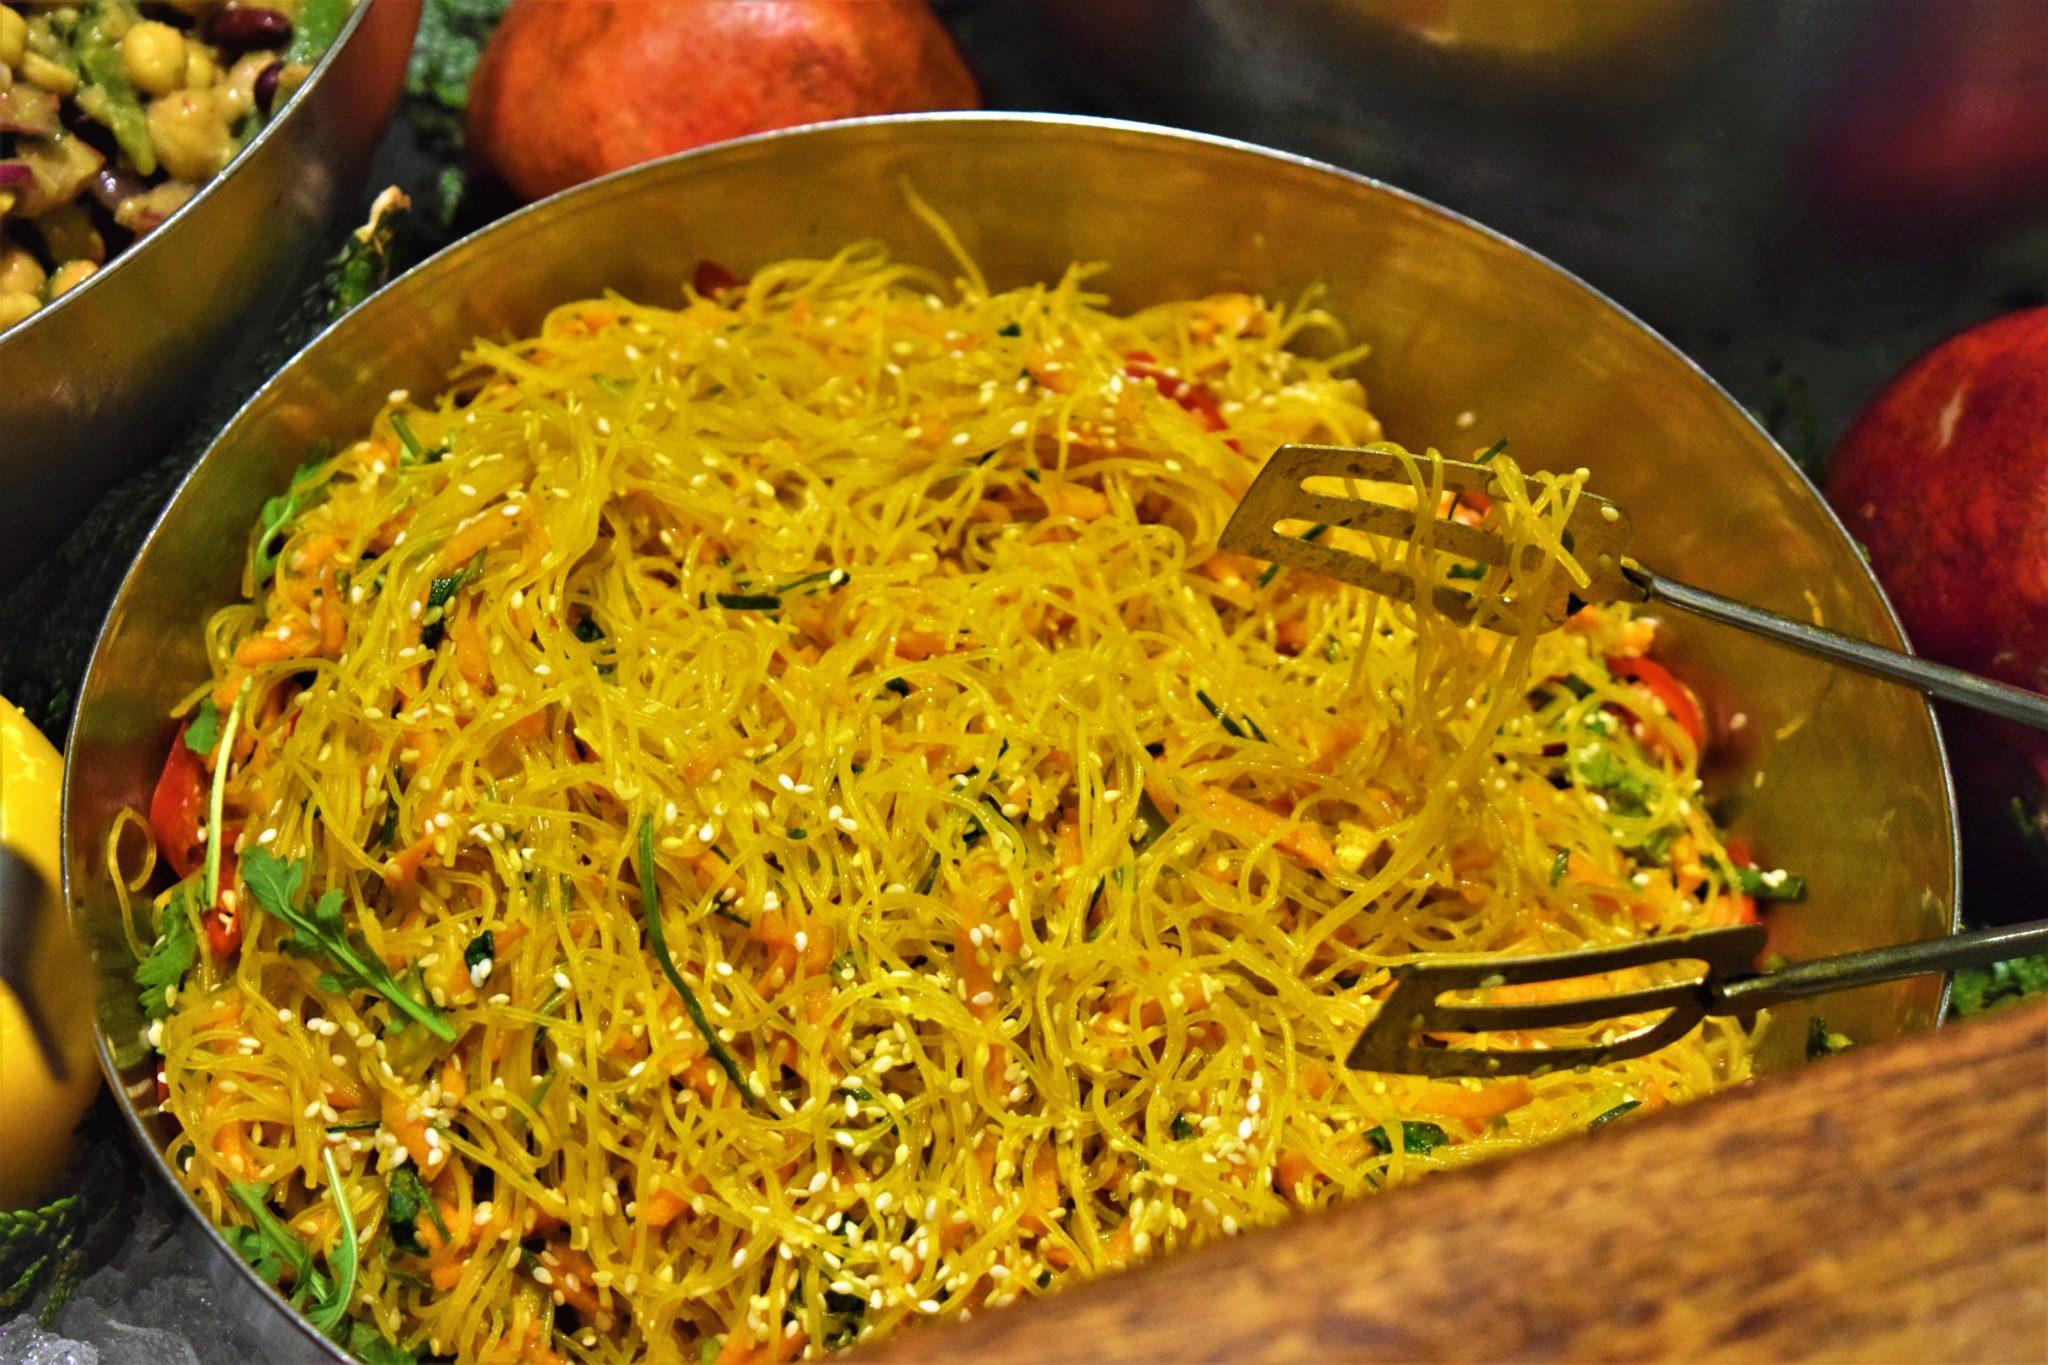 vegan food in stockholm, sweden, hermans buffet